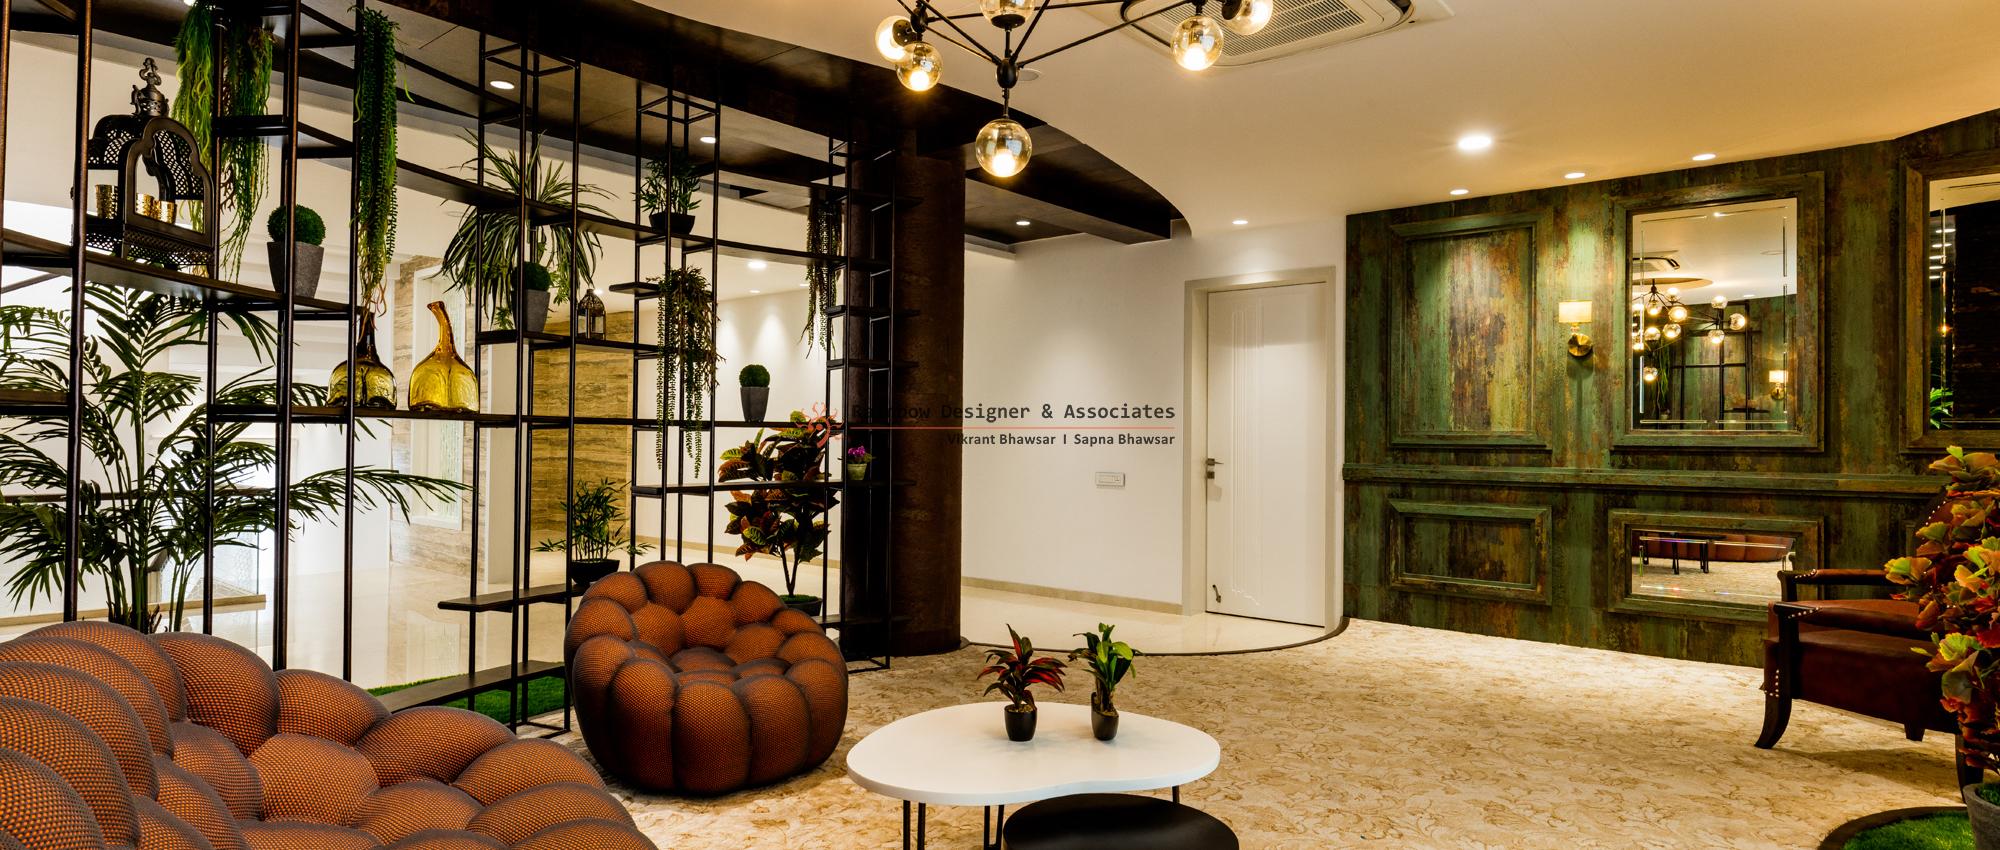 Rainbow Designers & Associates Indore